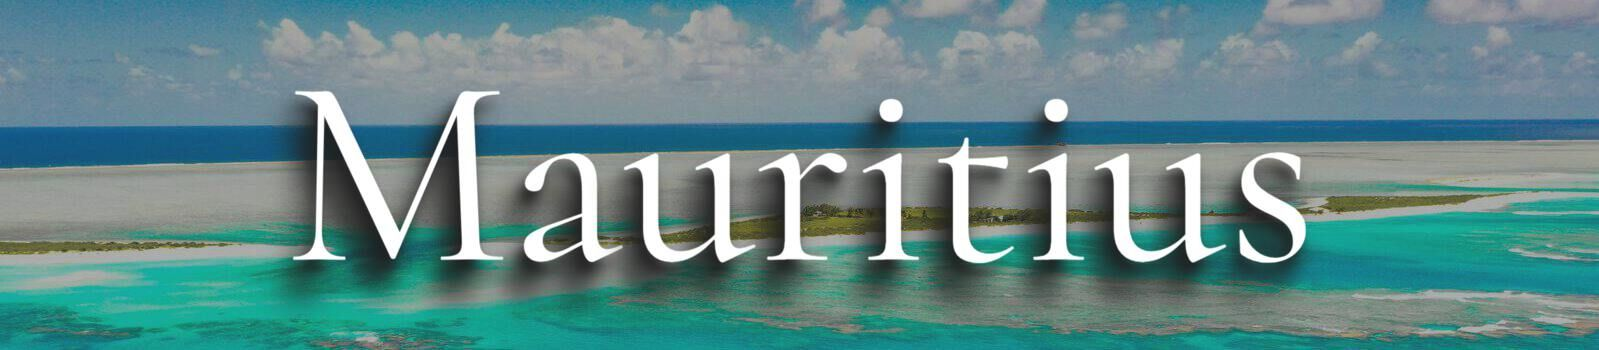 Mauritius Banner